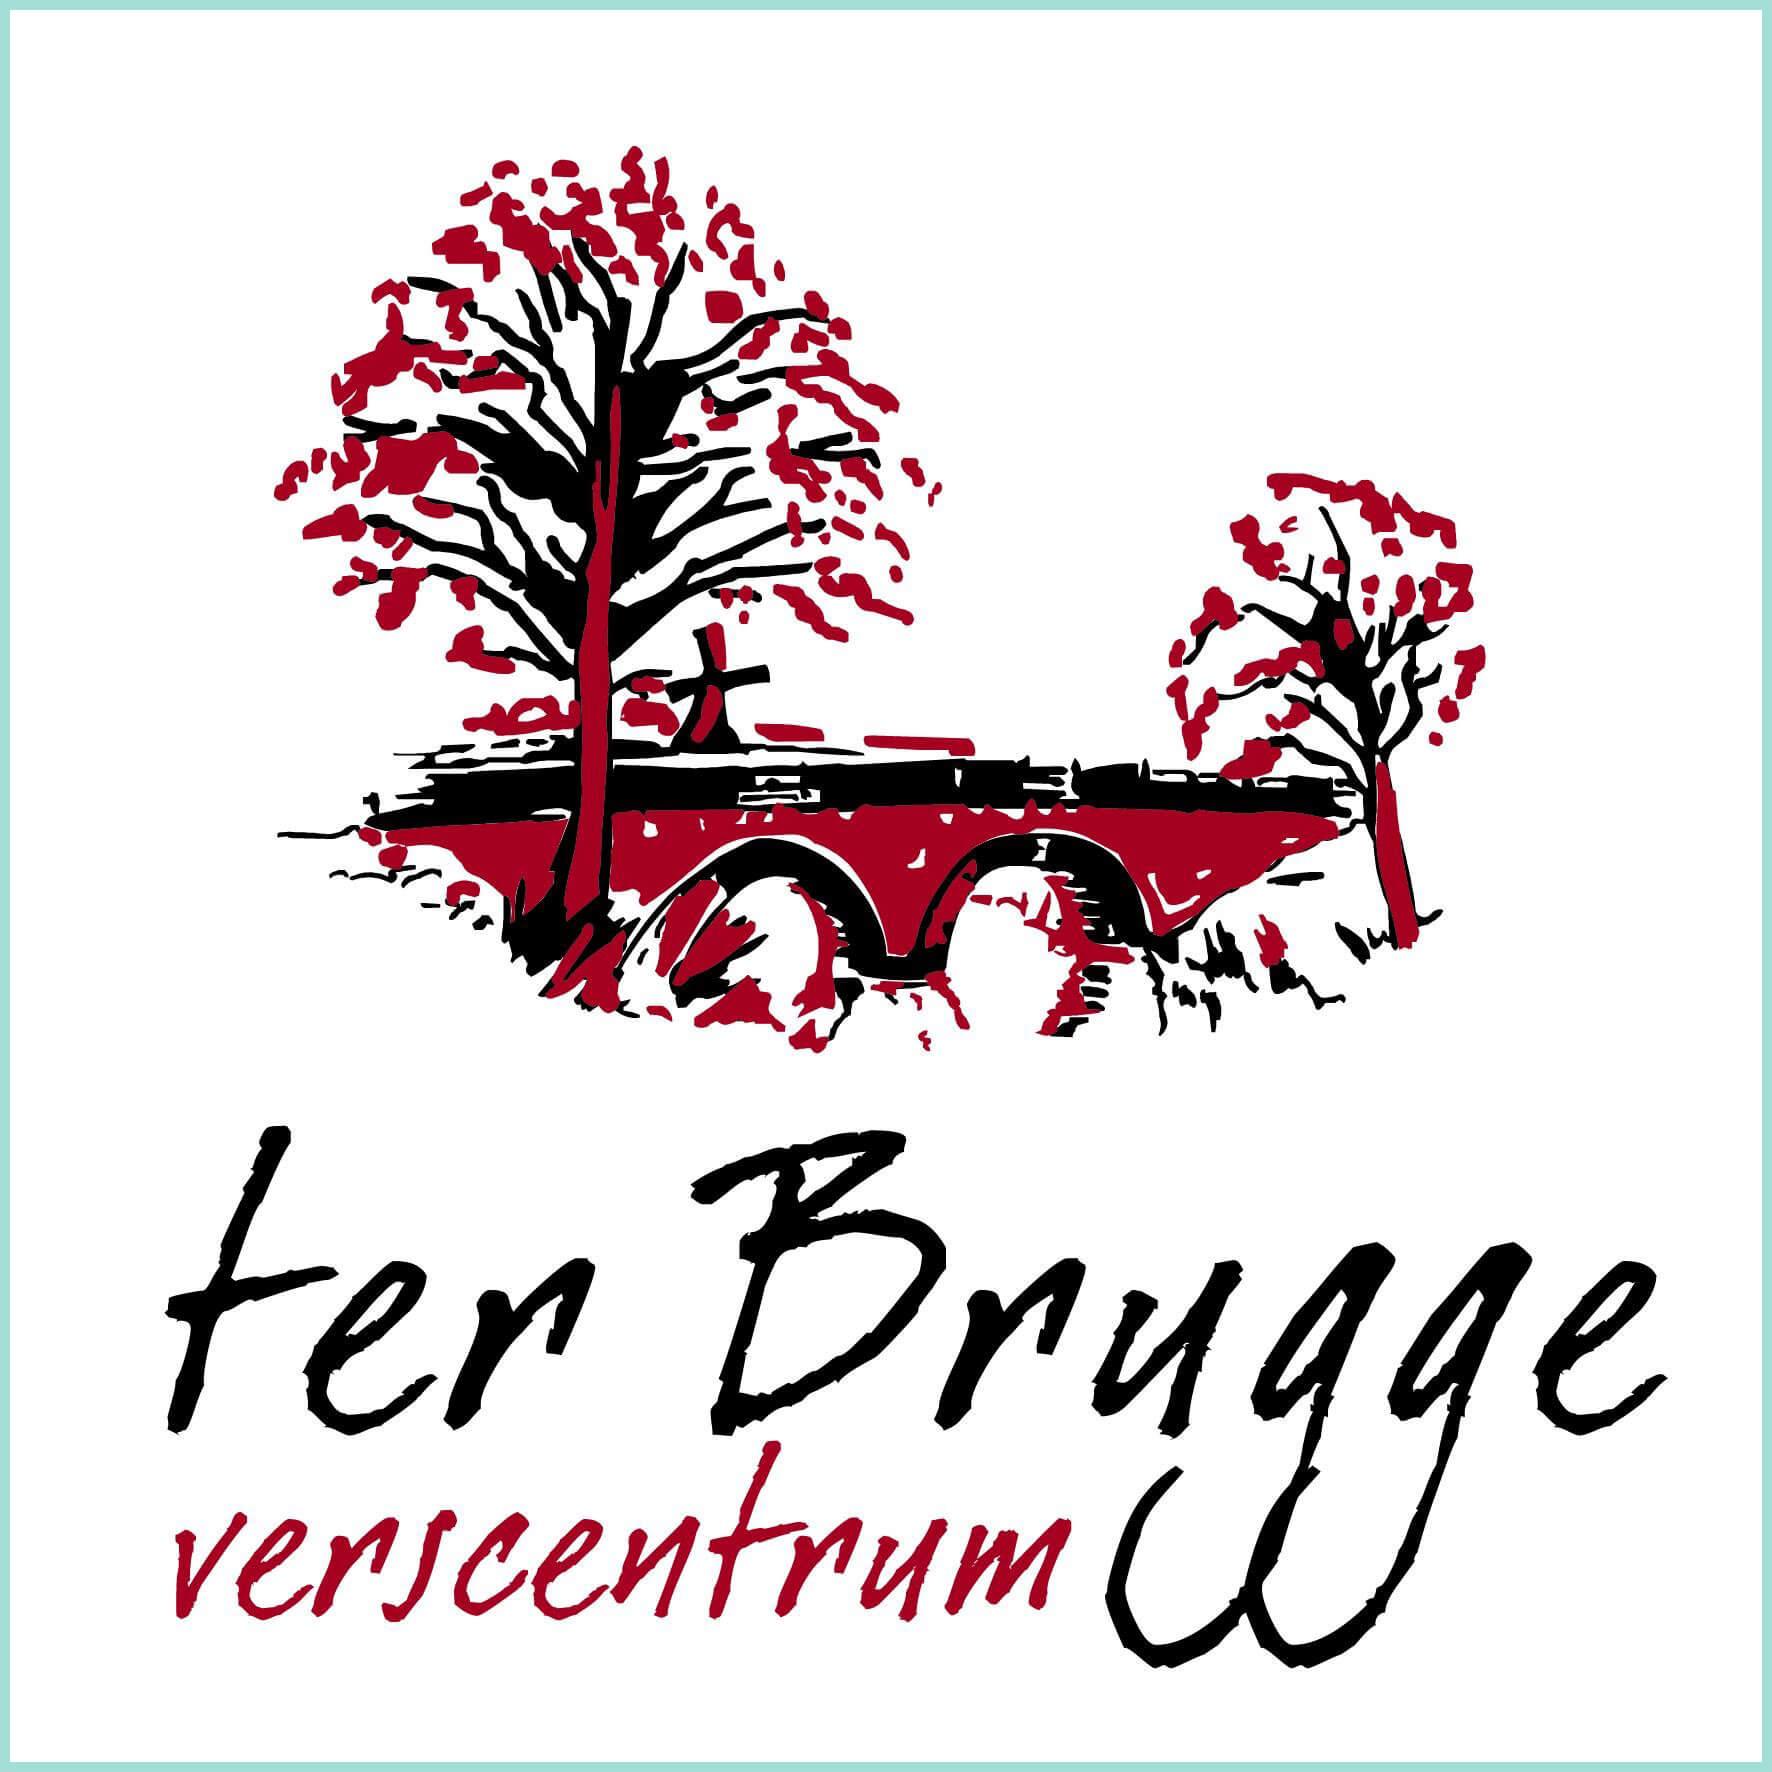 Ter_Brugge_Verscentrum_ALS_NL